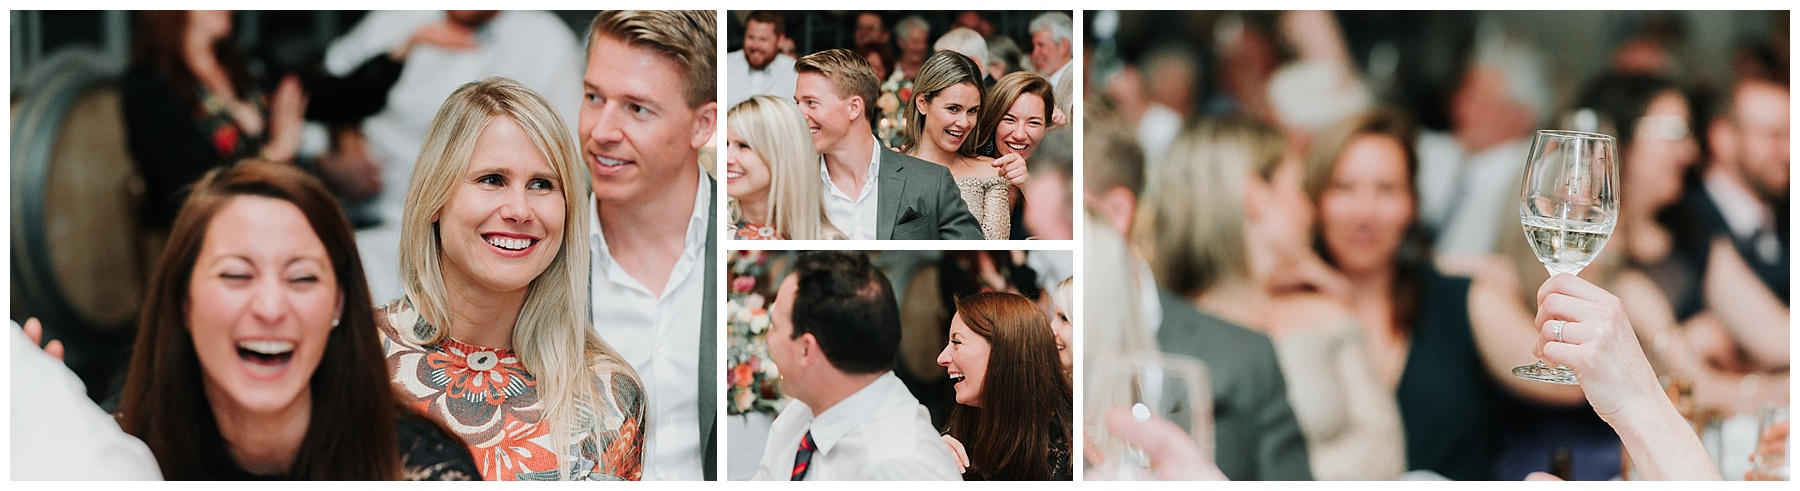 MARGAN Wedding Photographer_0059.jpg